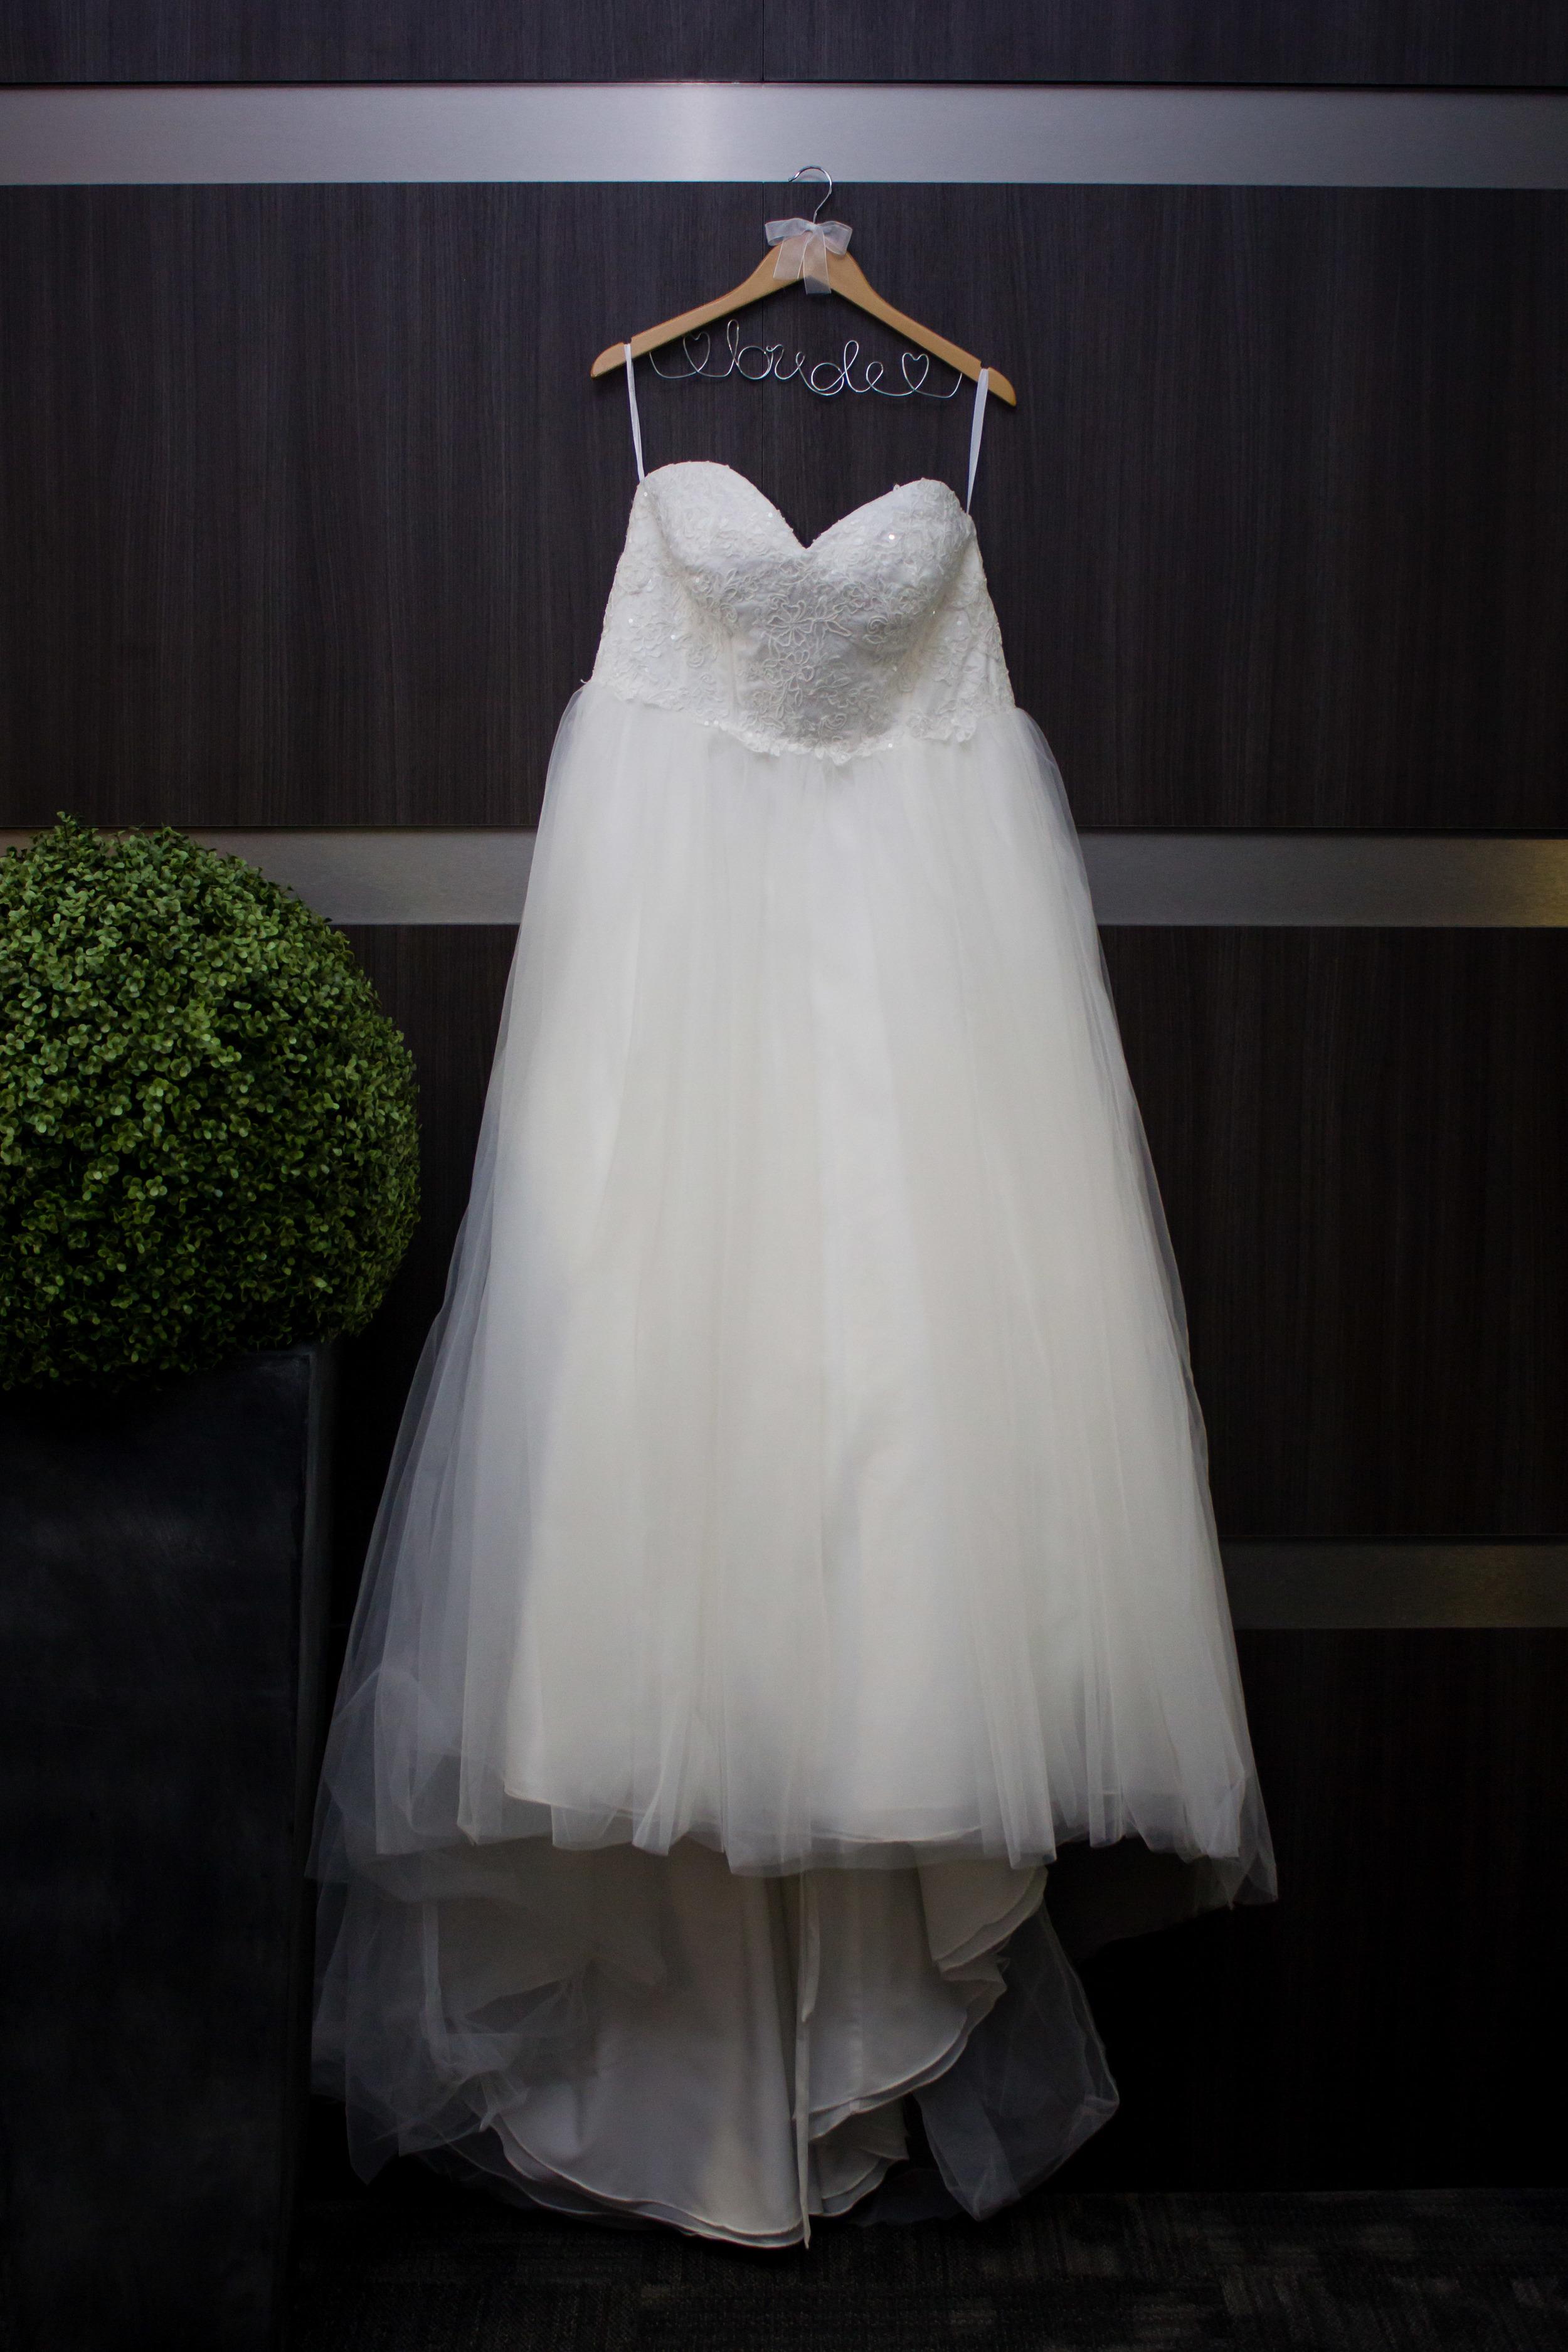 Kendra + Terrance | Wedding Details | Greenville NC Wedding | Eastern + Greenville NC Photographer | Bryant Tyson Photography | www.memoriesbybryant.com